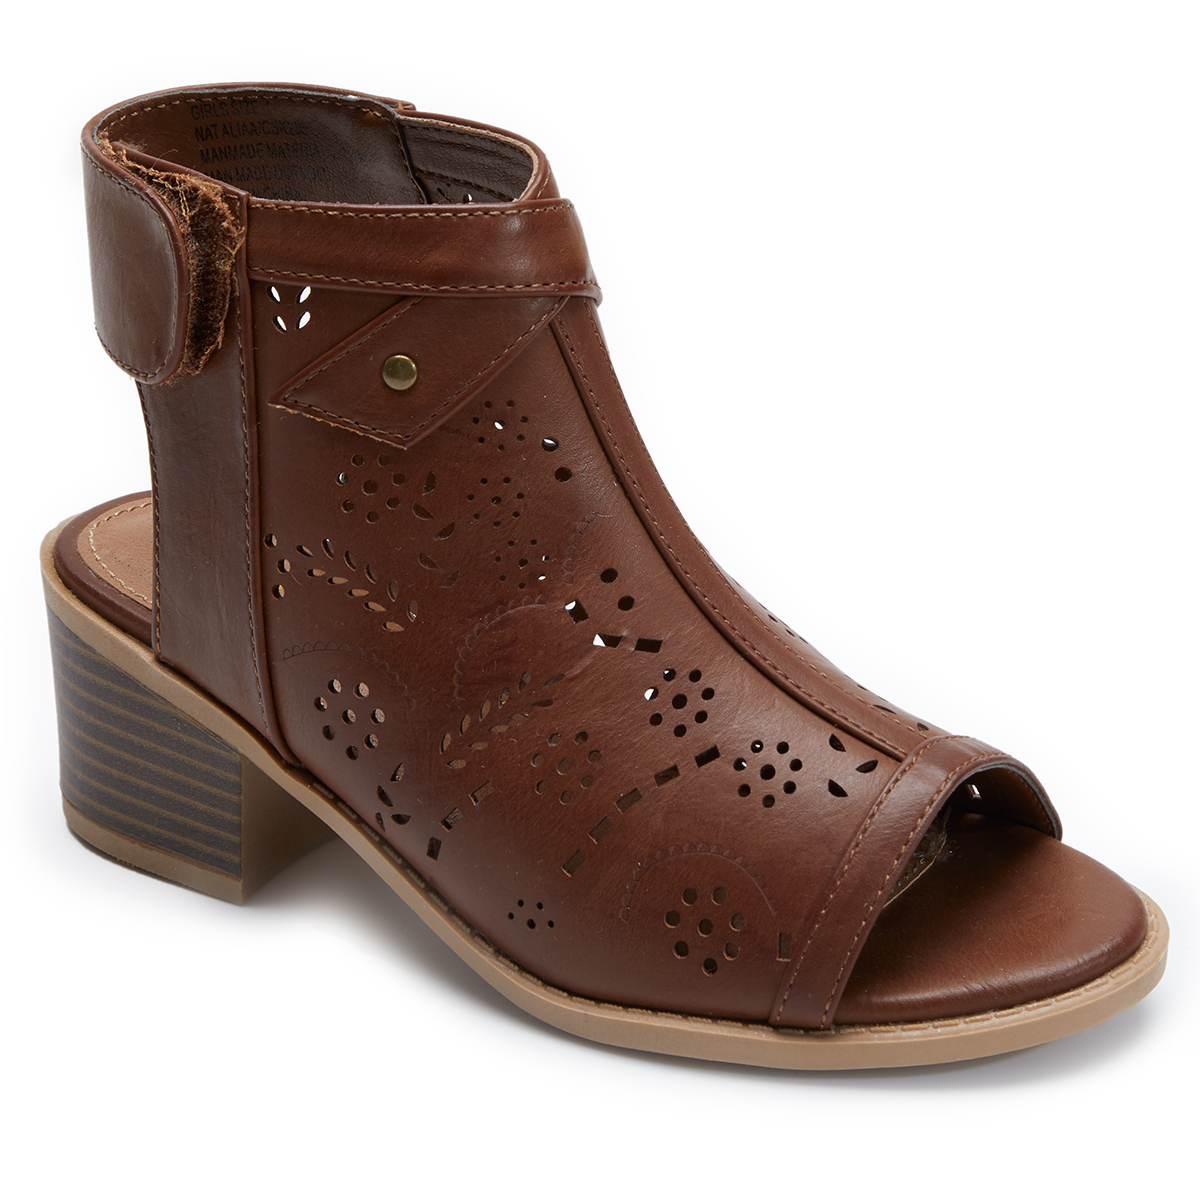 MIA Girls' Natalia Boots - Brown, 1